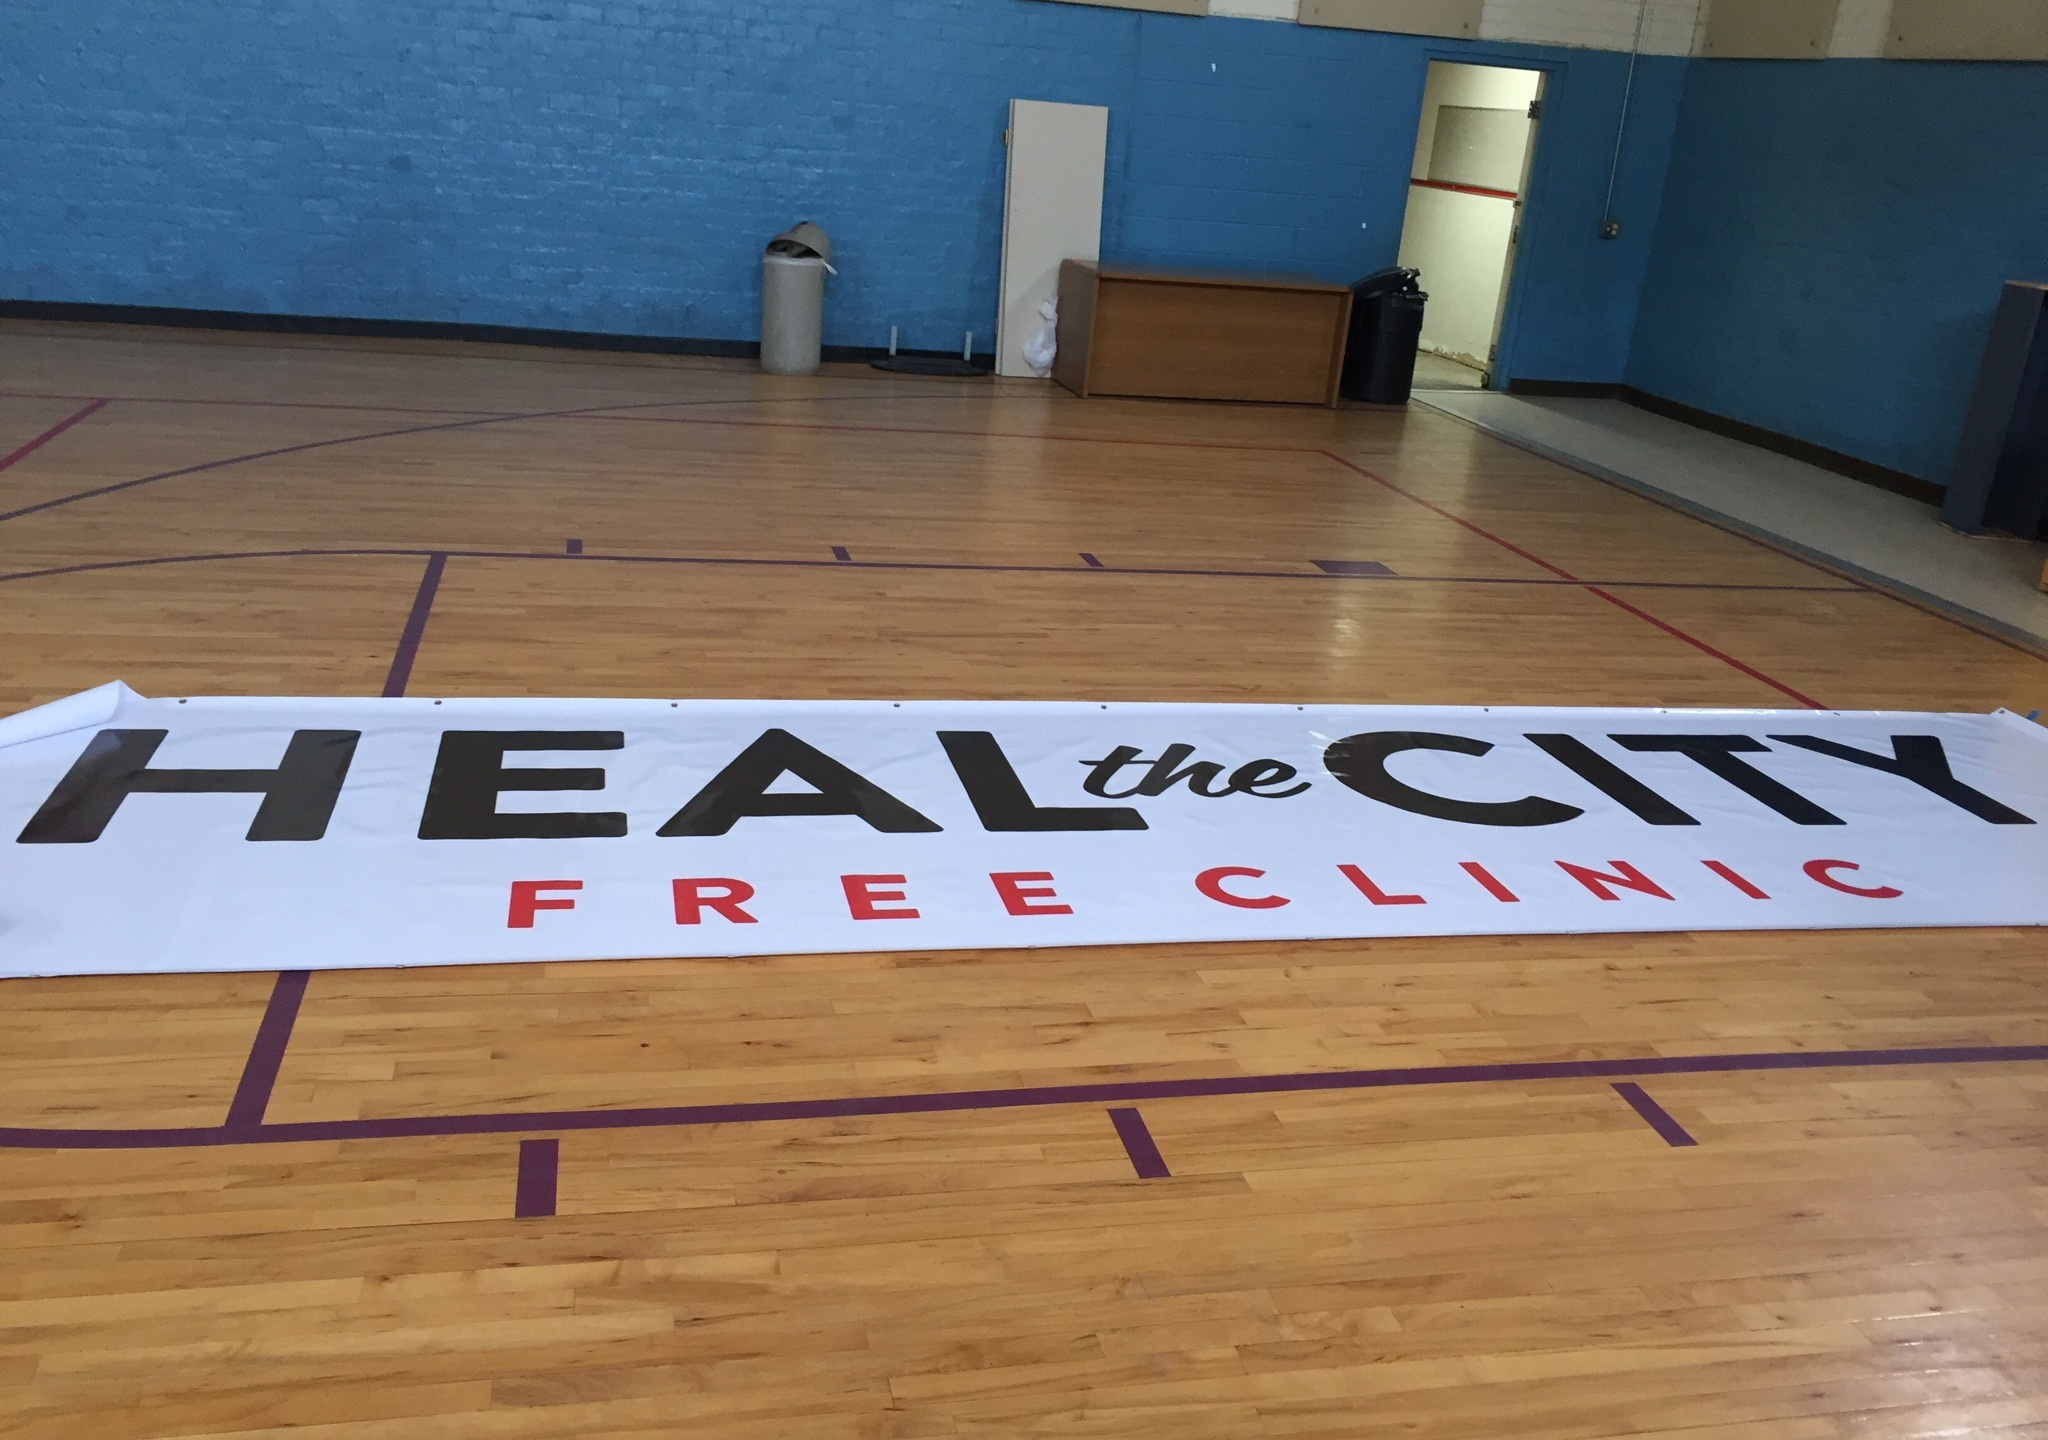 heal the city_1457118338821.jpg